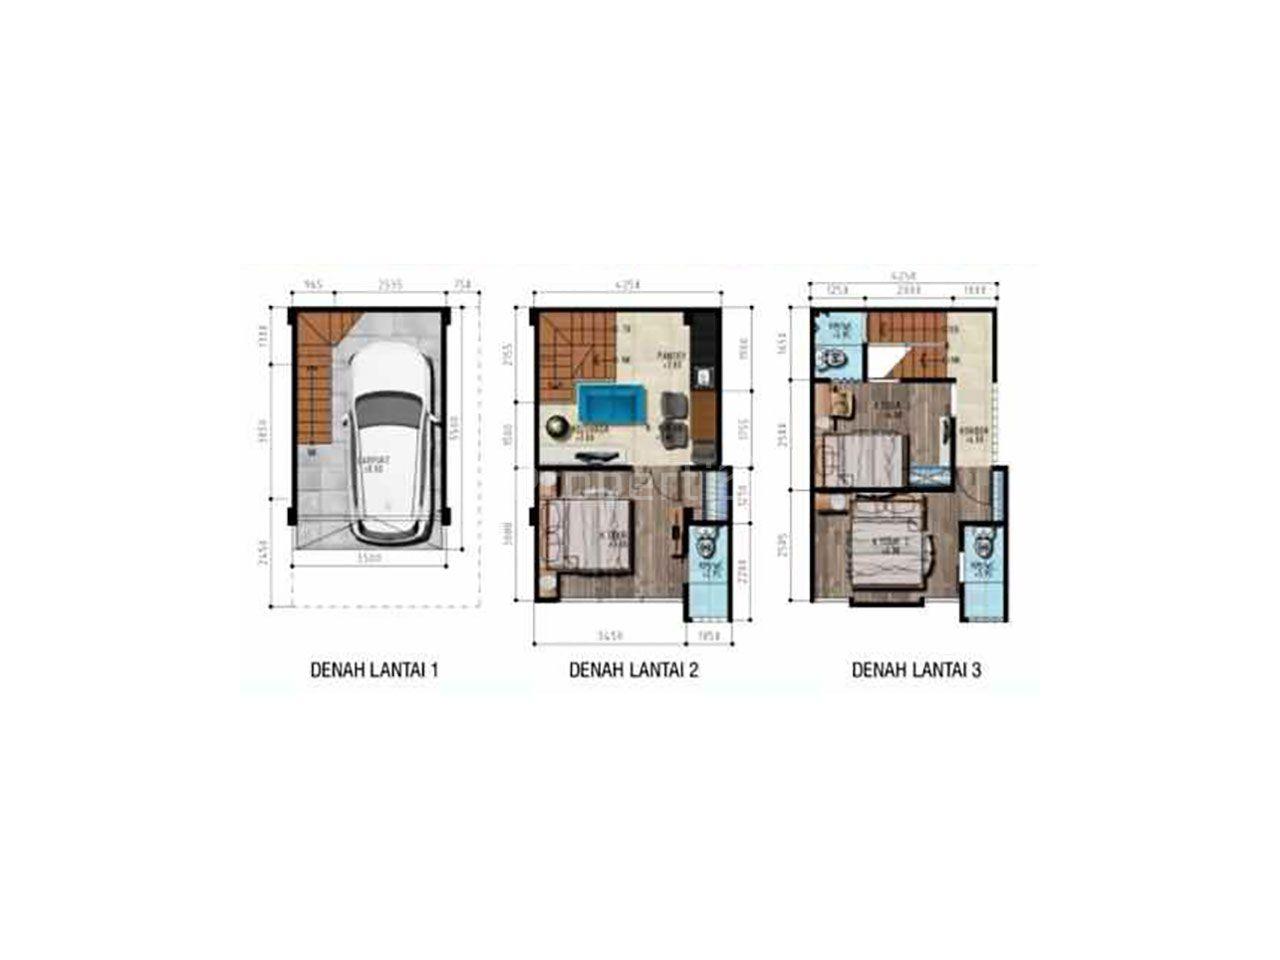 3-Storey Aparthouse in Blok M, Jakarta Selatan